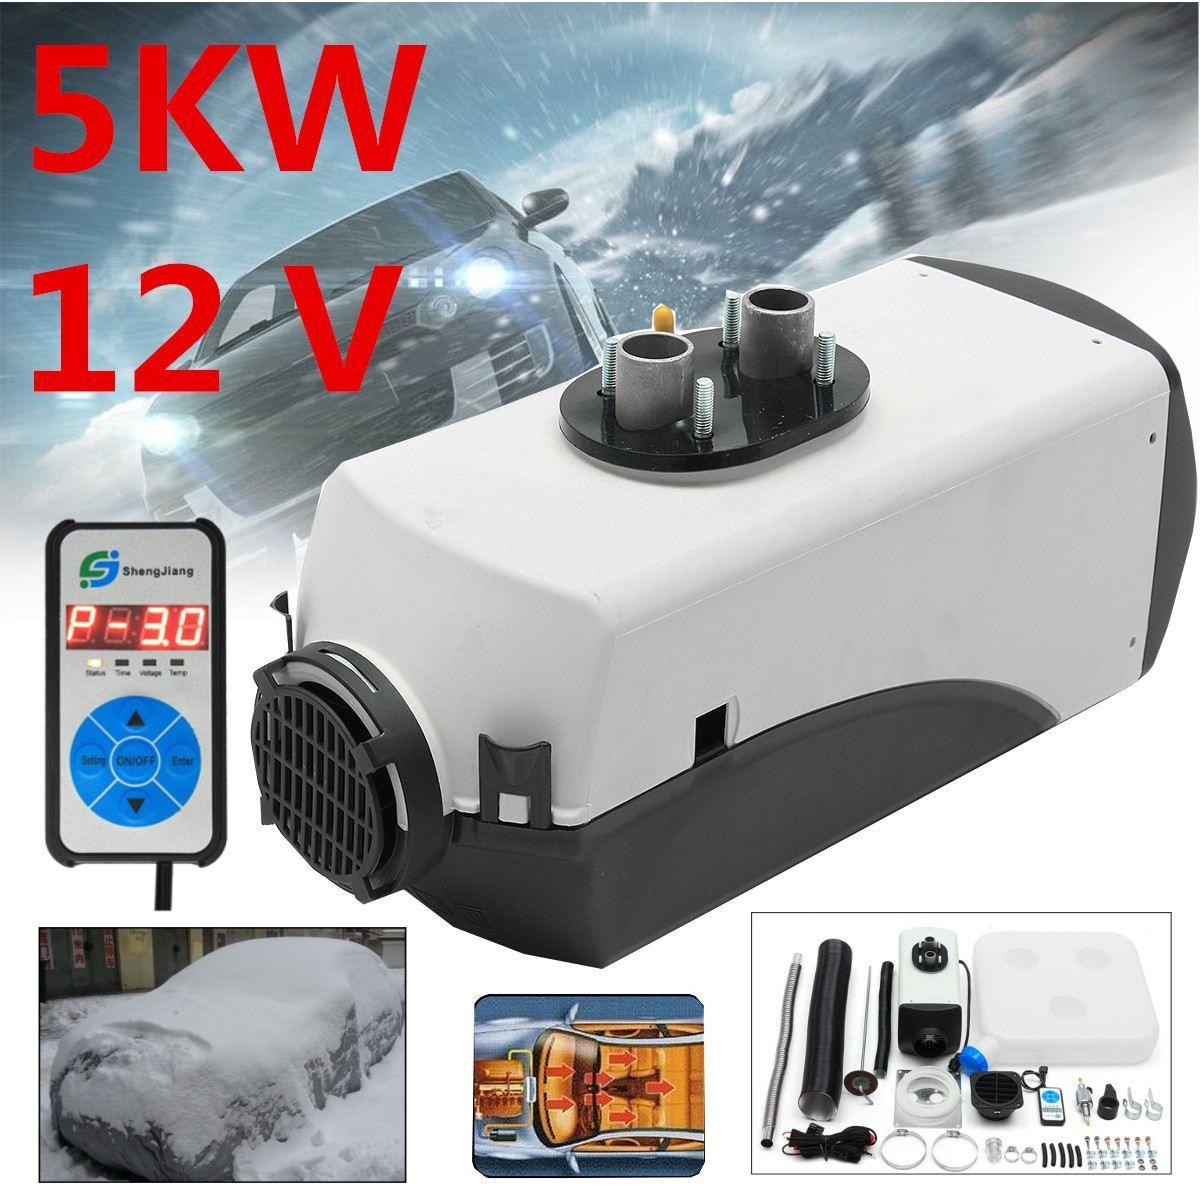 12V 5000W Air diesel- Heater 5 kW for trucks, motor-homes, boats, bus HOT Digital Switch Car Heater